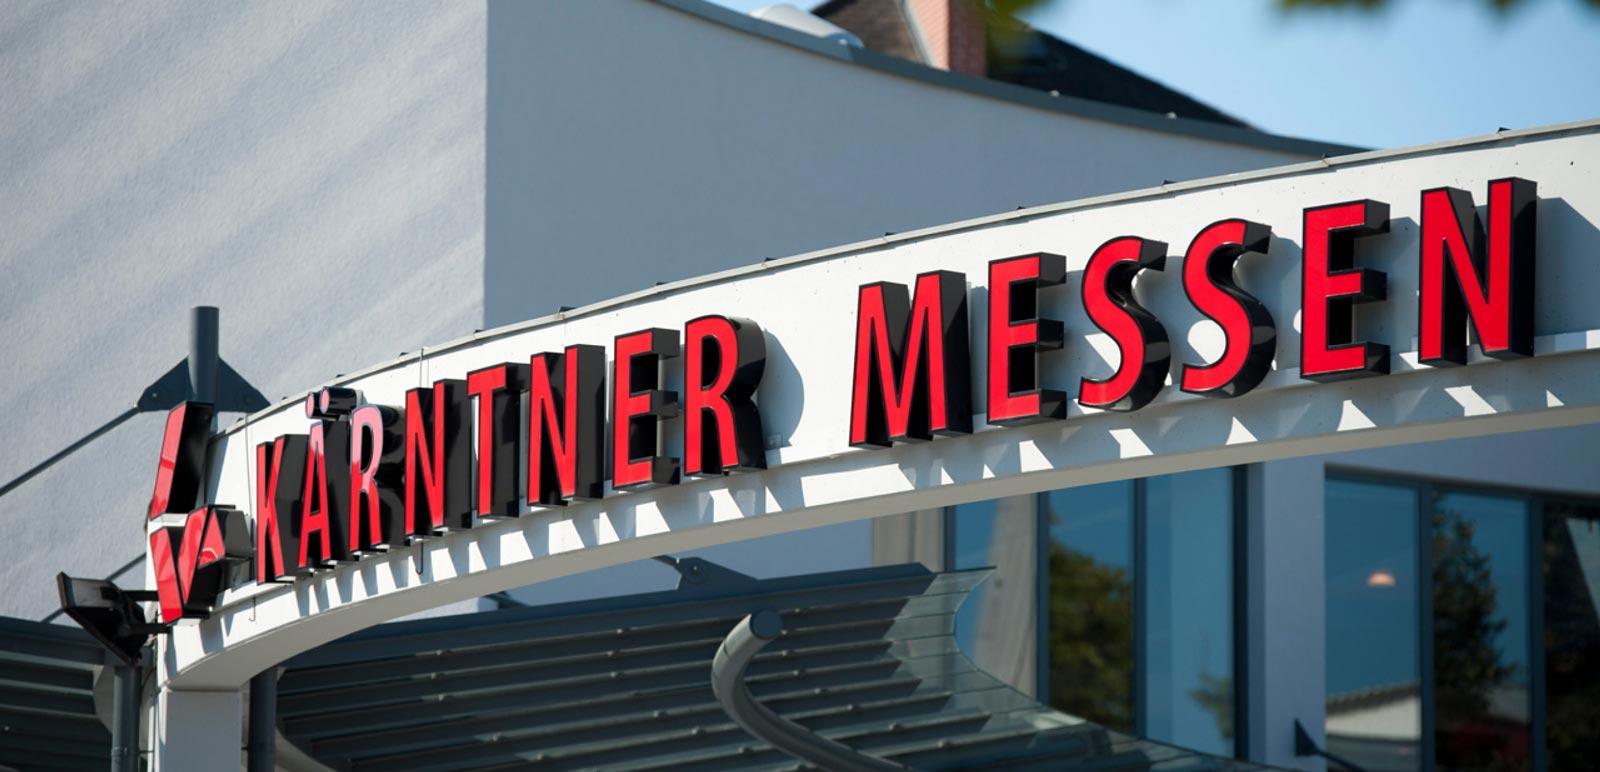 (c) Kaerntnermessen.at